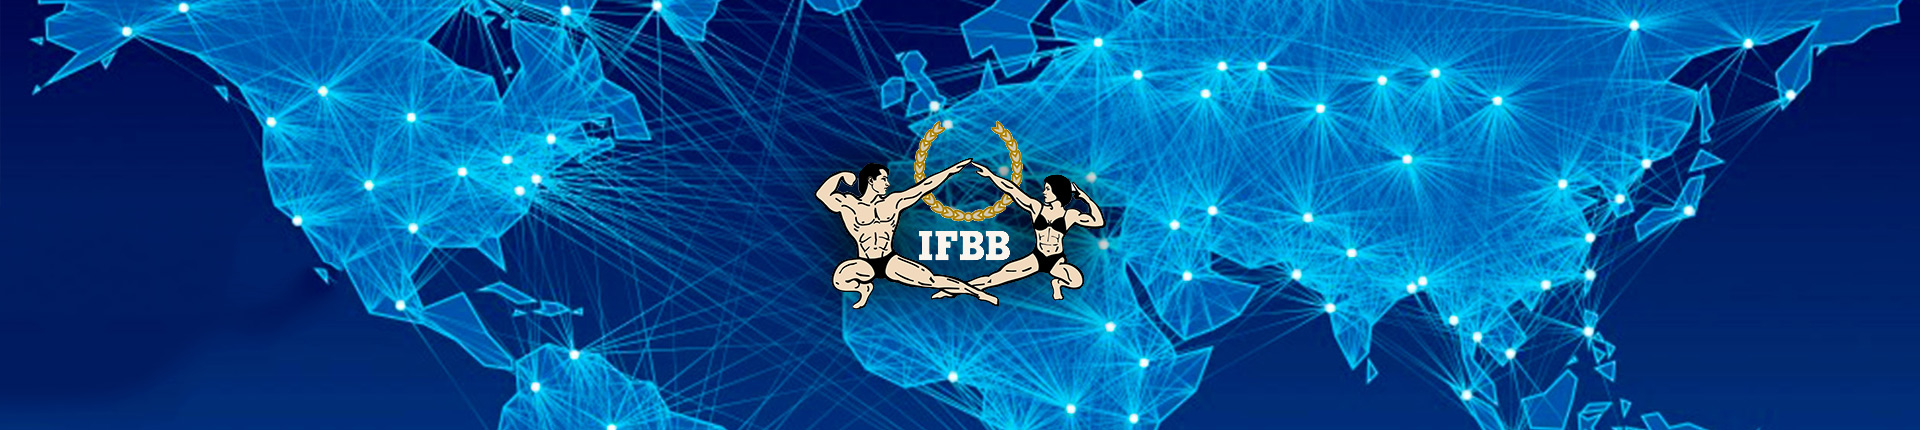 Ranking IFBB 2019 IFBB World Ranking 2019